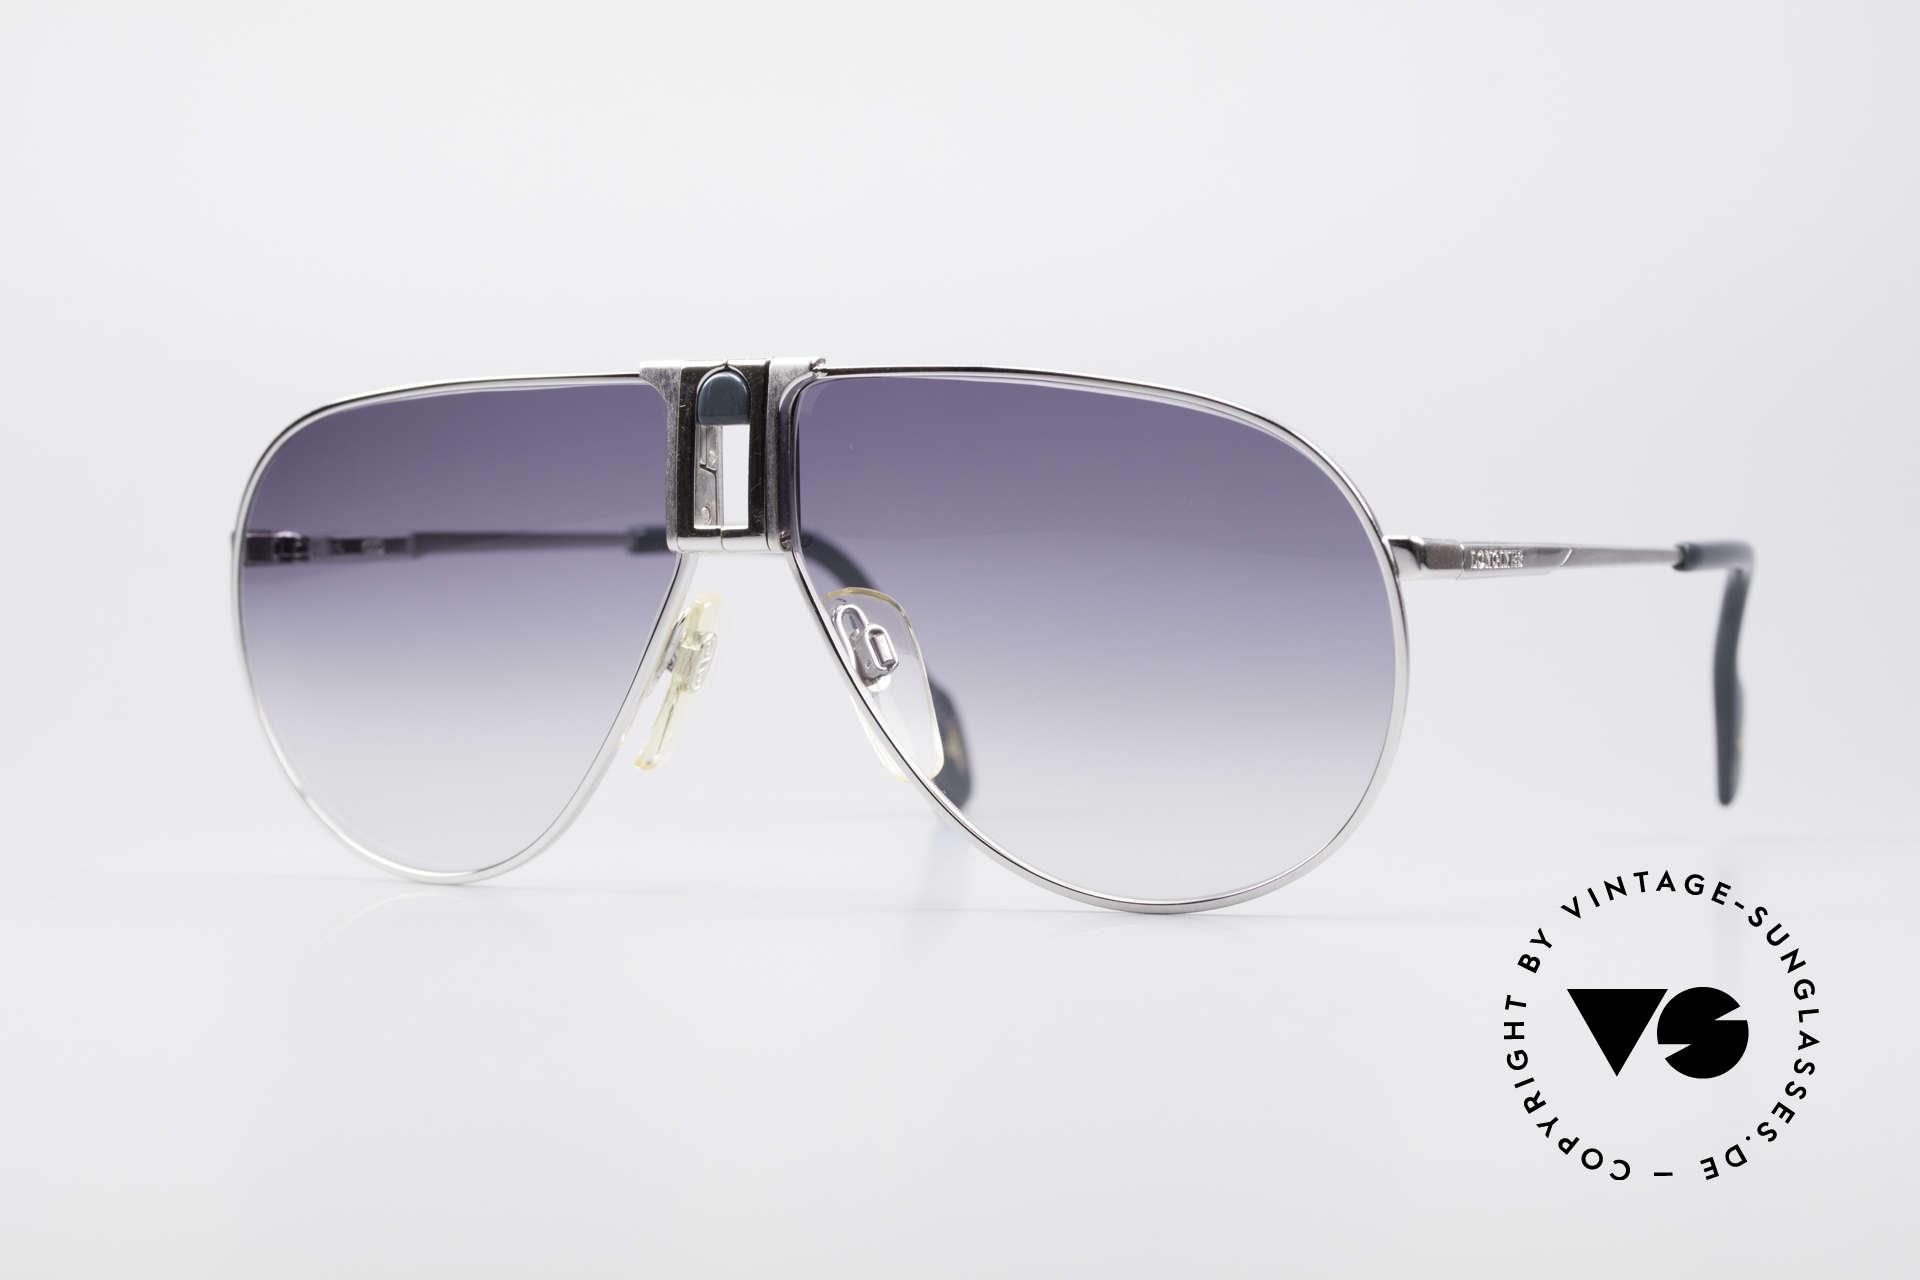 Longines 0154 Large 80's Aviator Sunglasses, high-end VINTAGE designer sunglasses by LONGINES, Made for Men